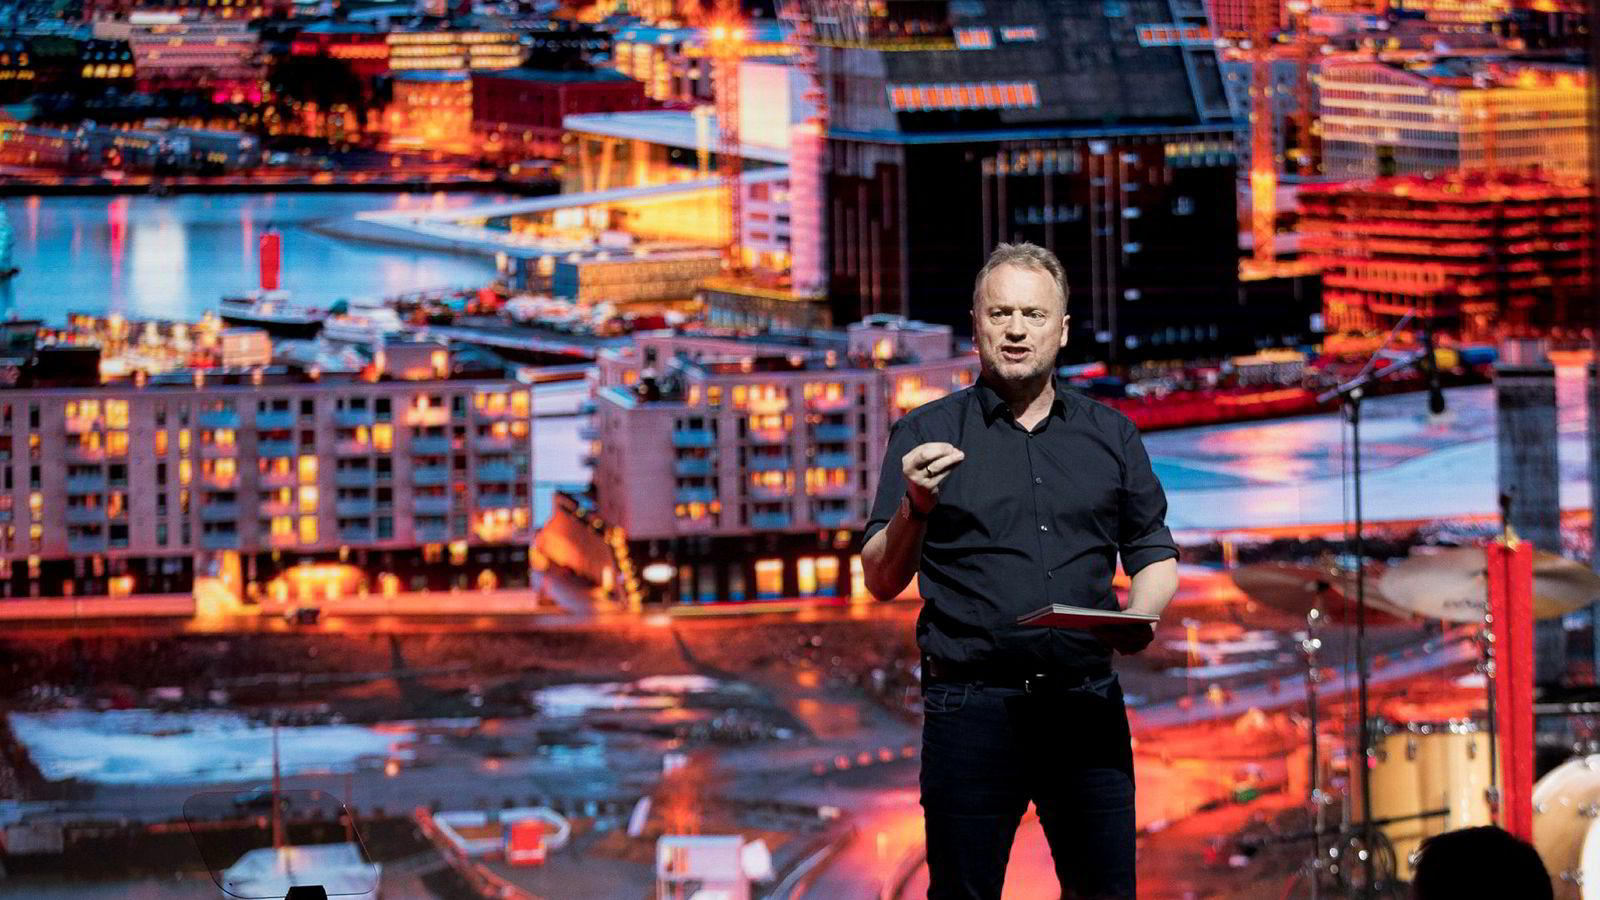 Byrådsleder Raymond Johansen (Ap) i Oslo tar Fremskrittspartiets bompengeforslag med lave skuldre.